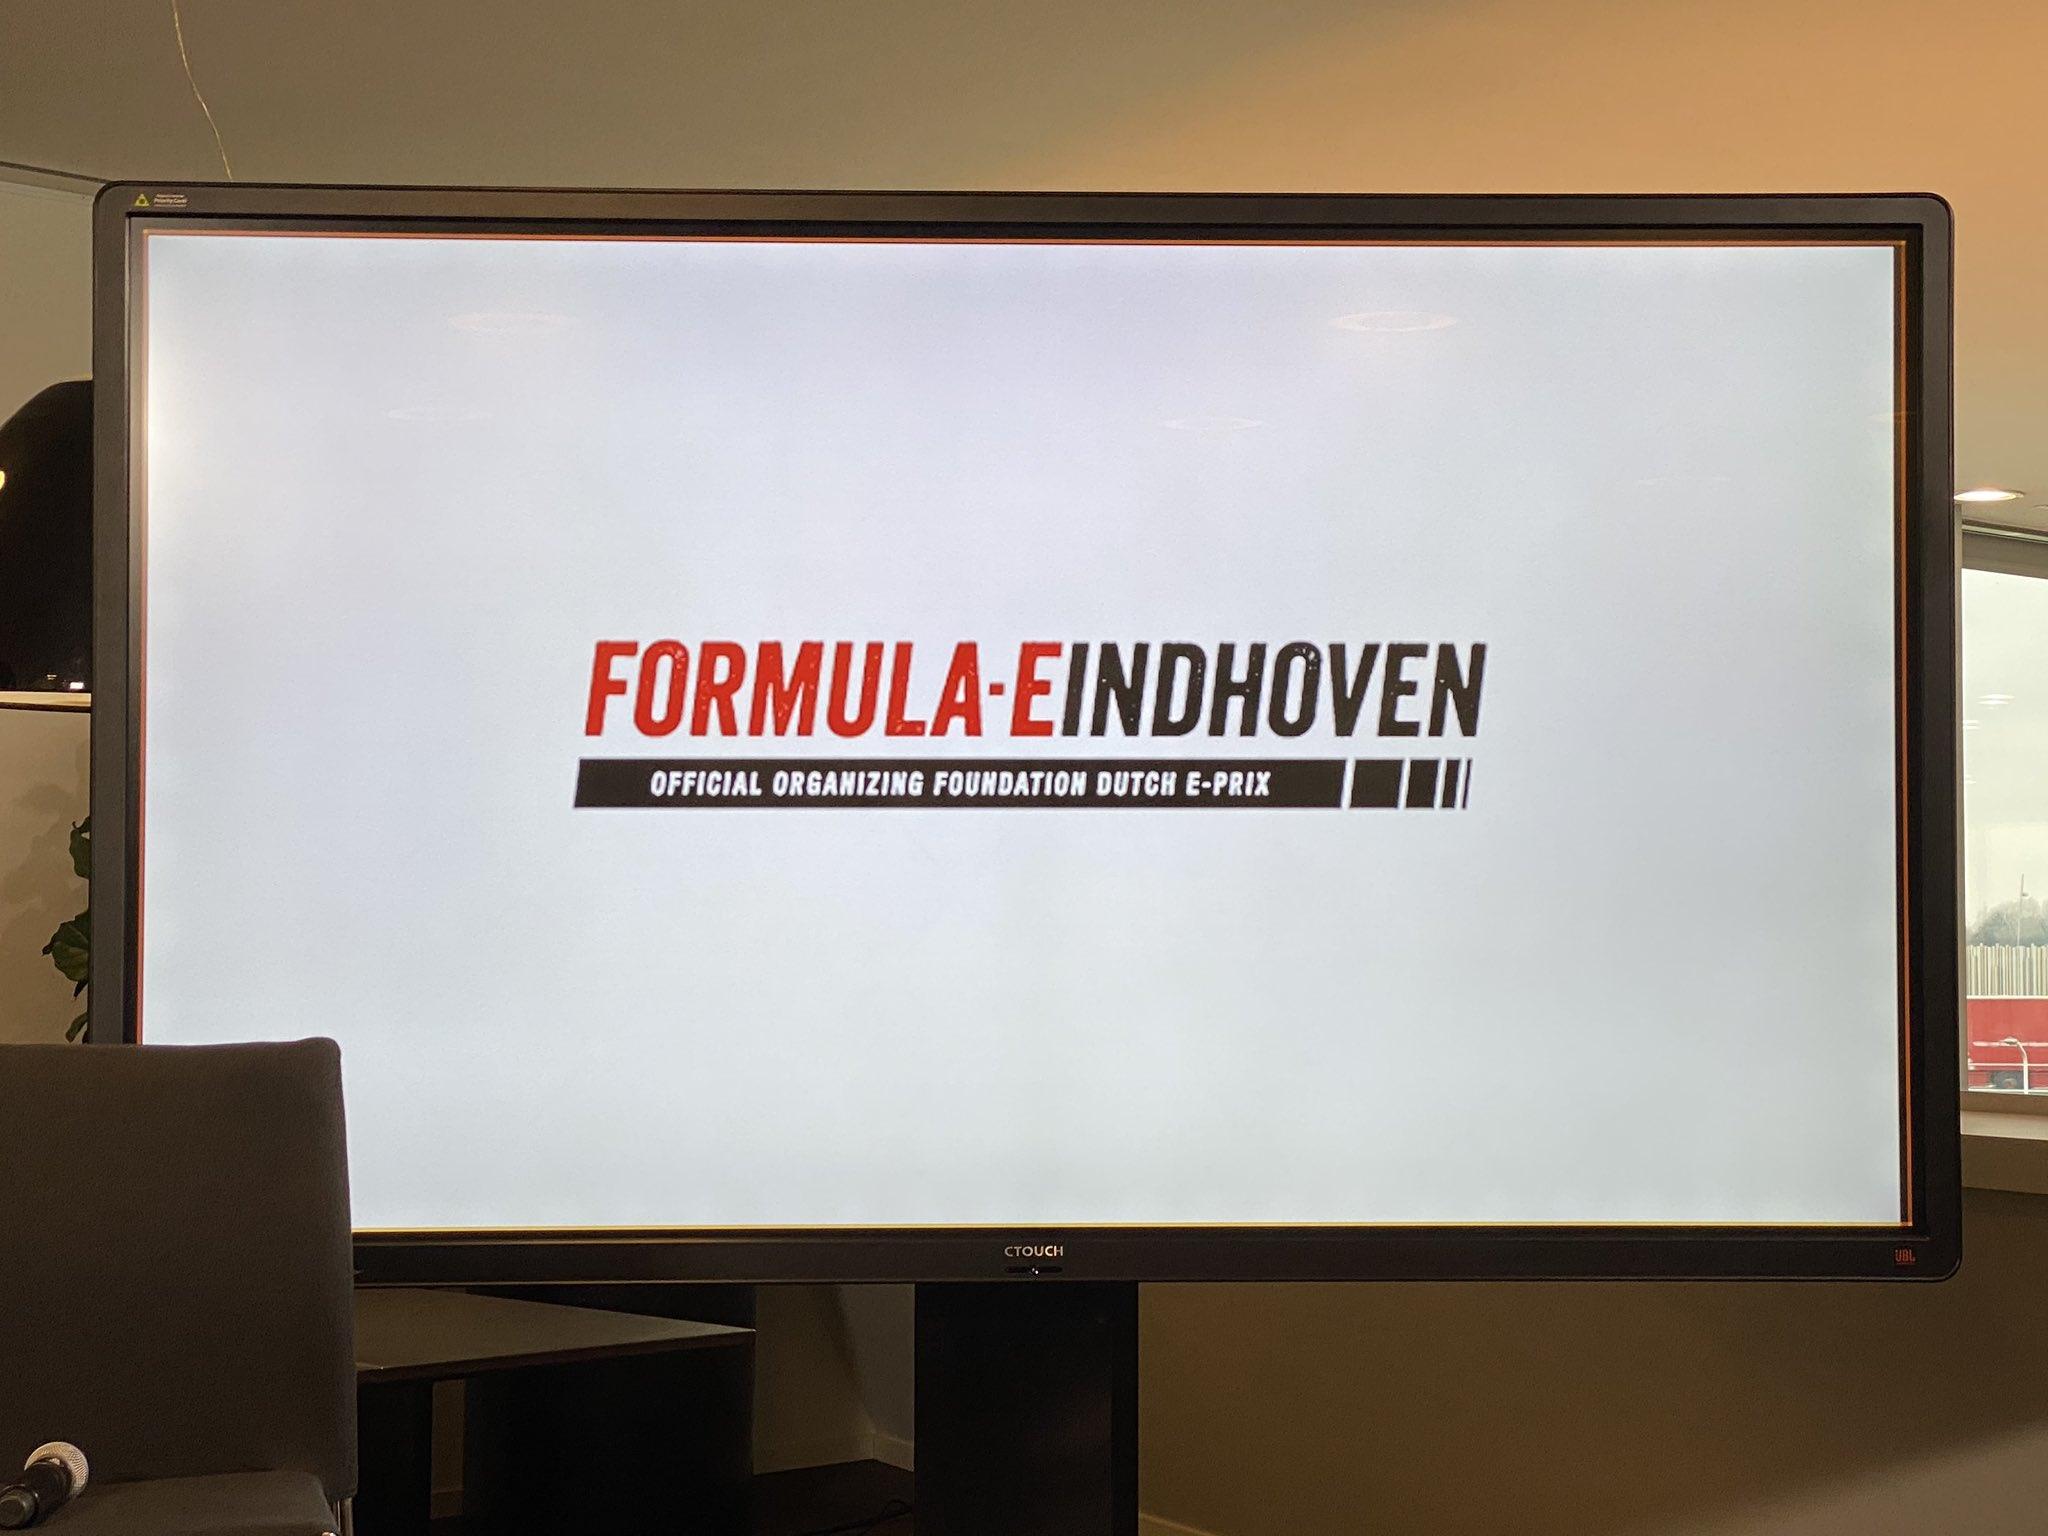 Слайд-анонс гонки ФЕ в Нидерландах